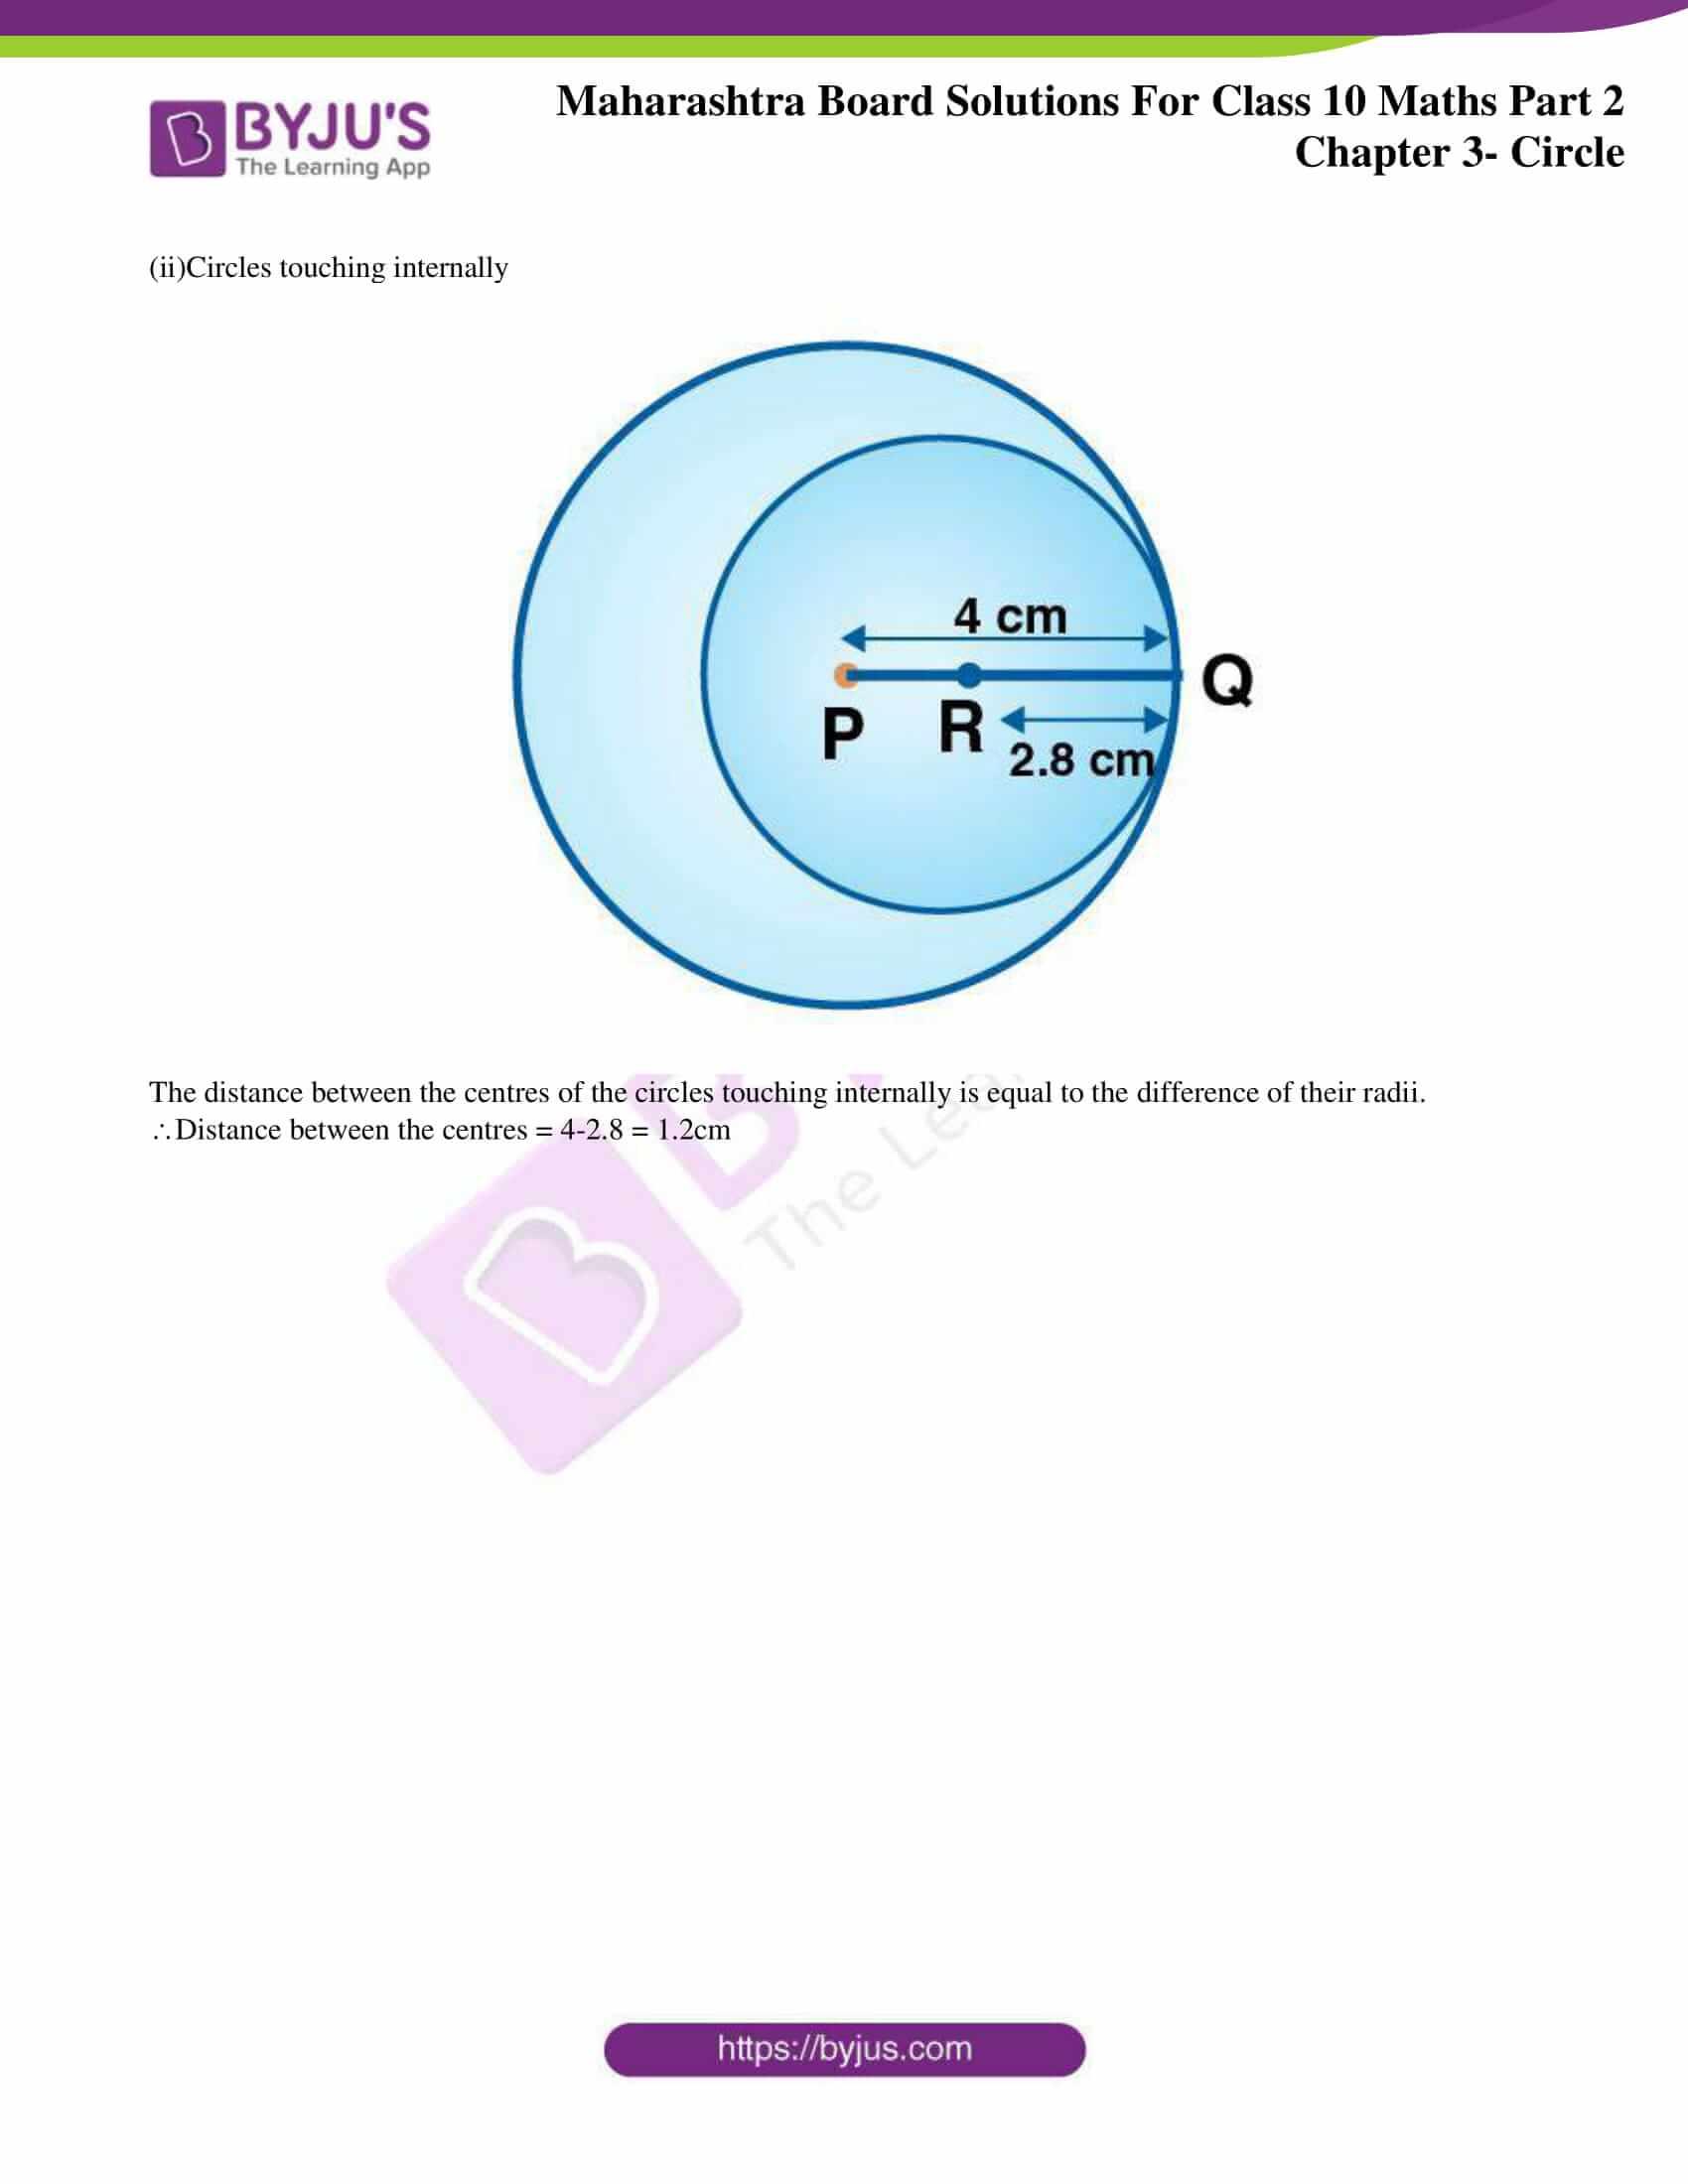 msbshse sol class 10 maths part 2 chapter 3 06